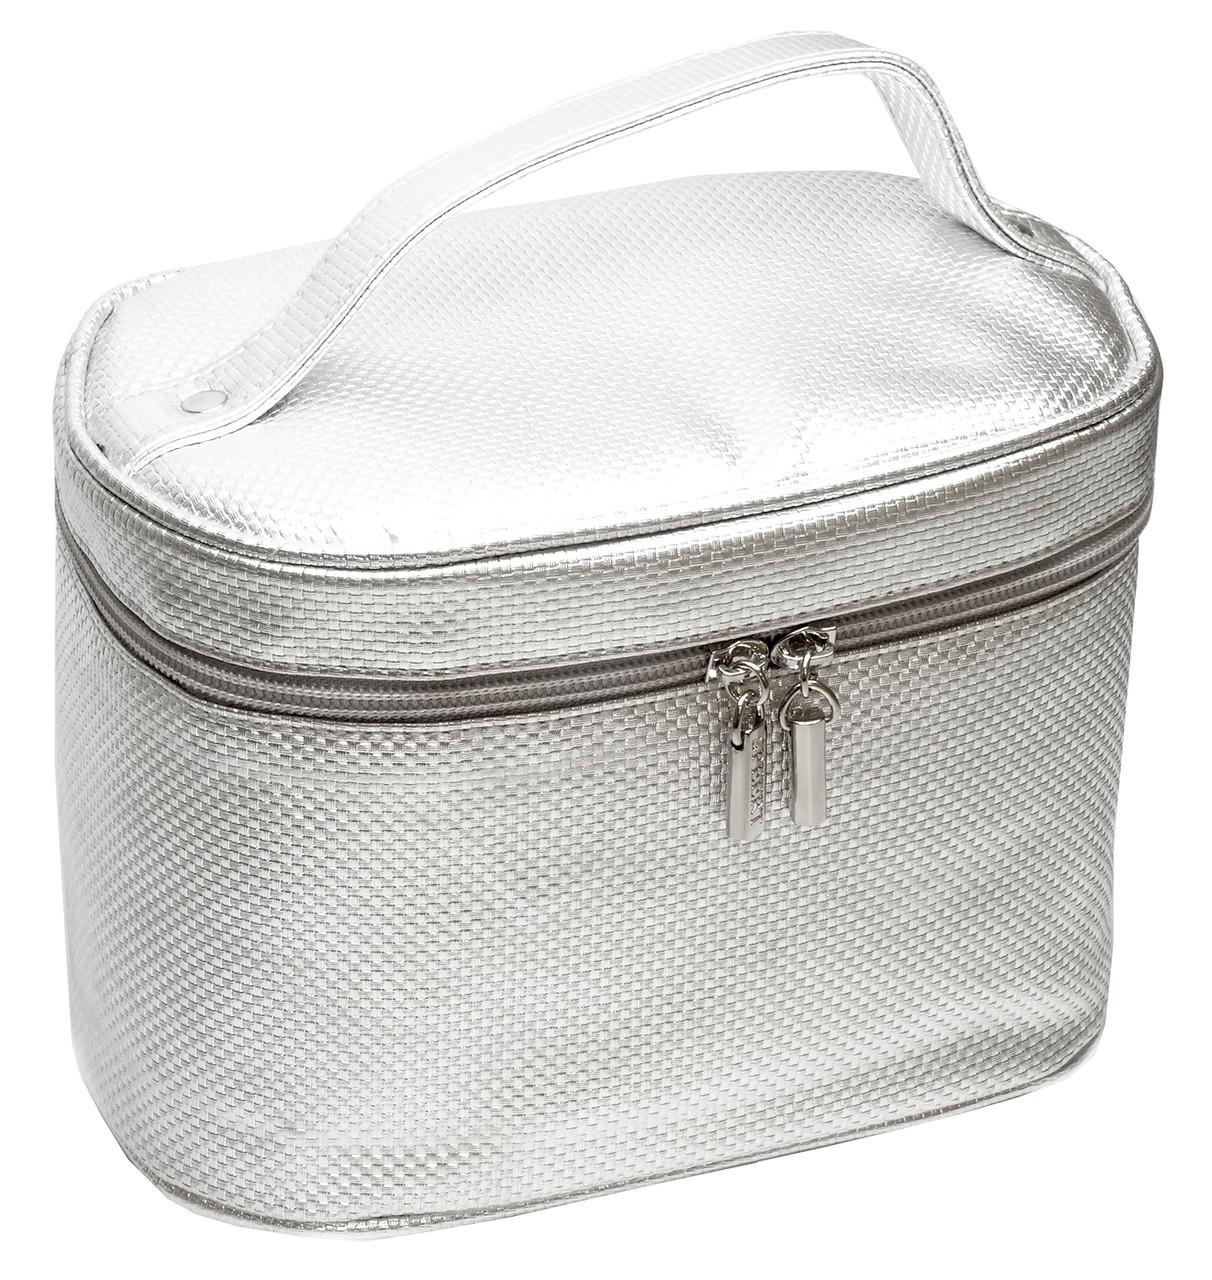 6493fb3451b6 Speert Designer Cosmetic Bag Style 4004